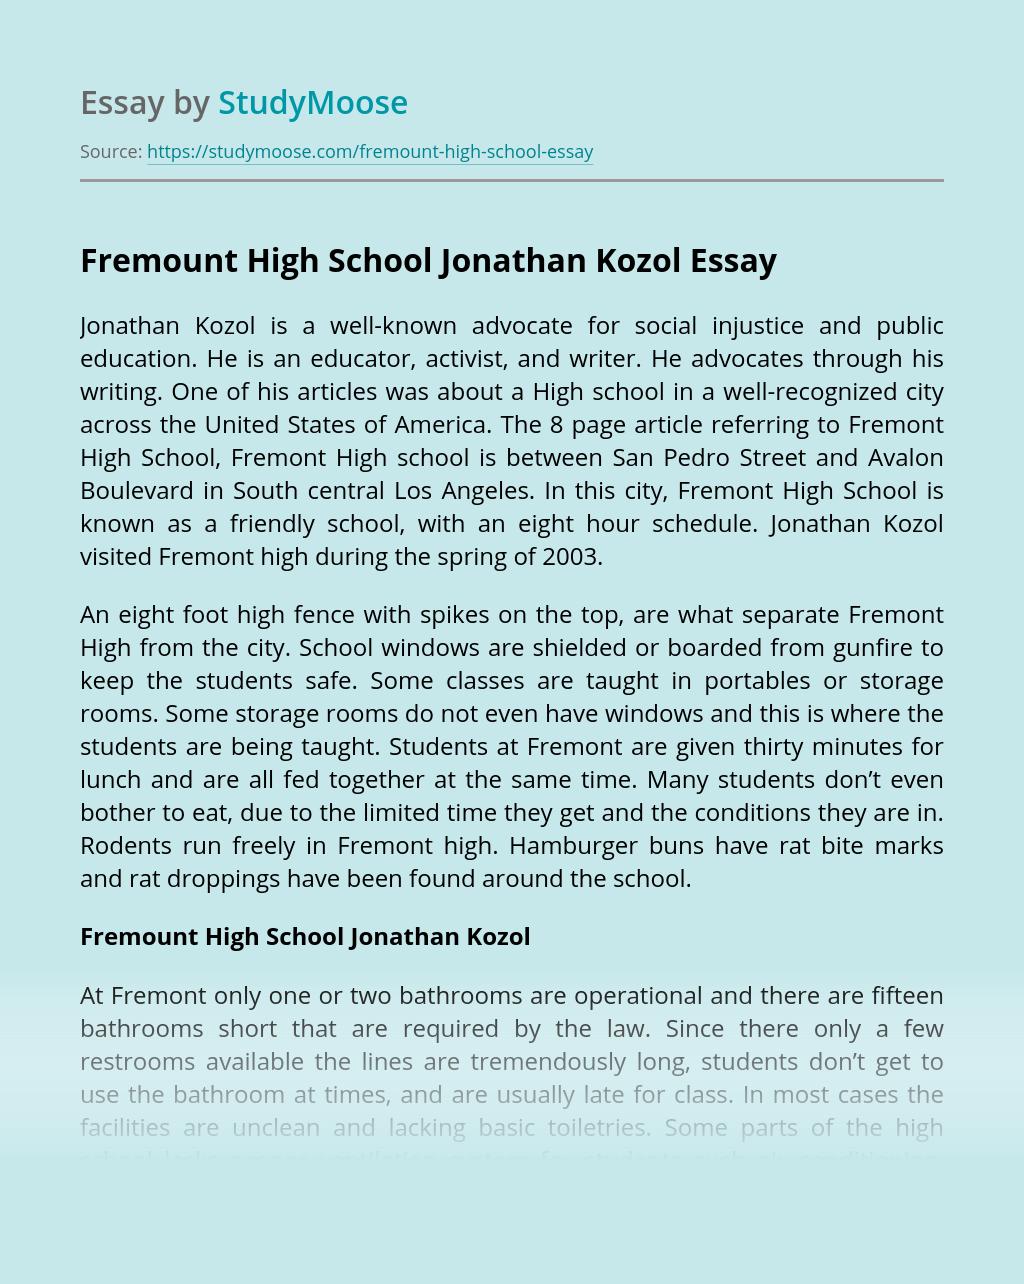 Fremount High School Jonathan Kozol